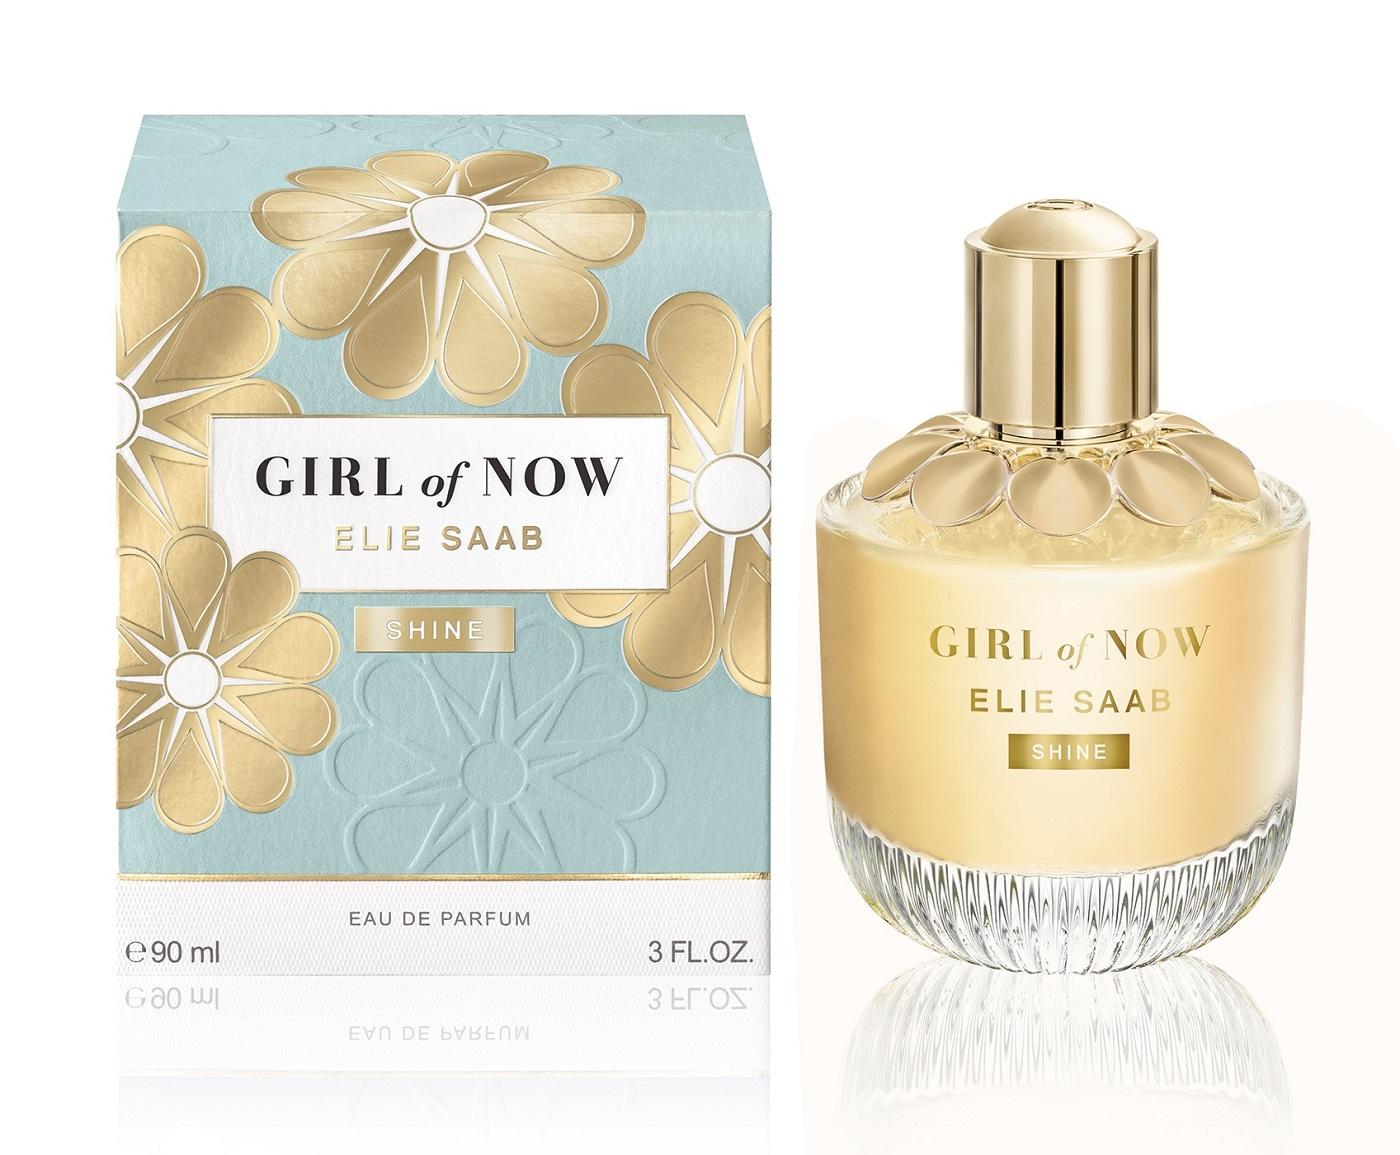 Fragrances ~ Of Saab Now Girl New Elie Shine kZ8wNnO0PX